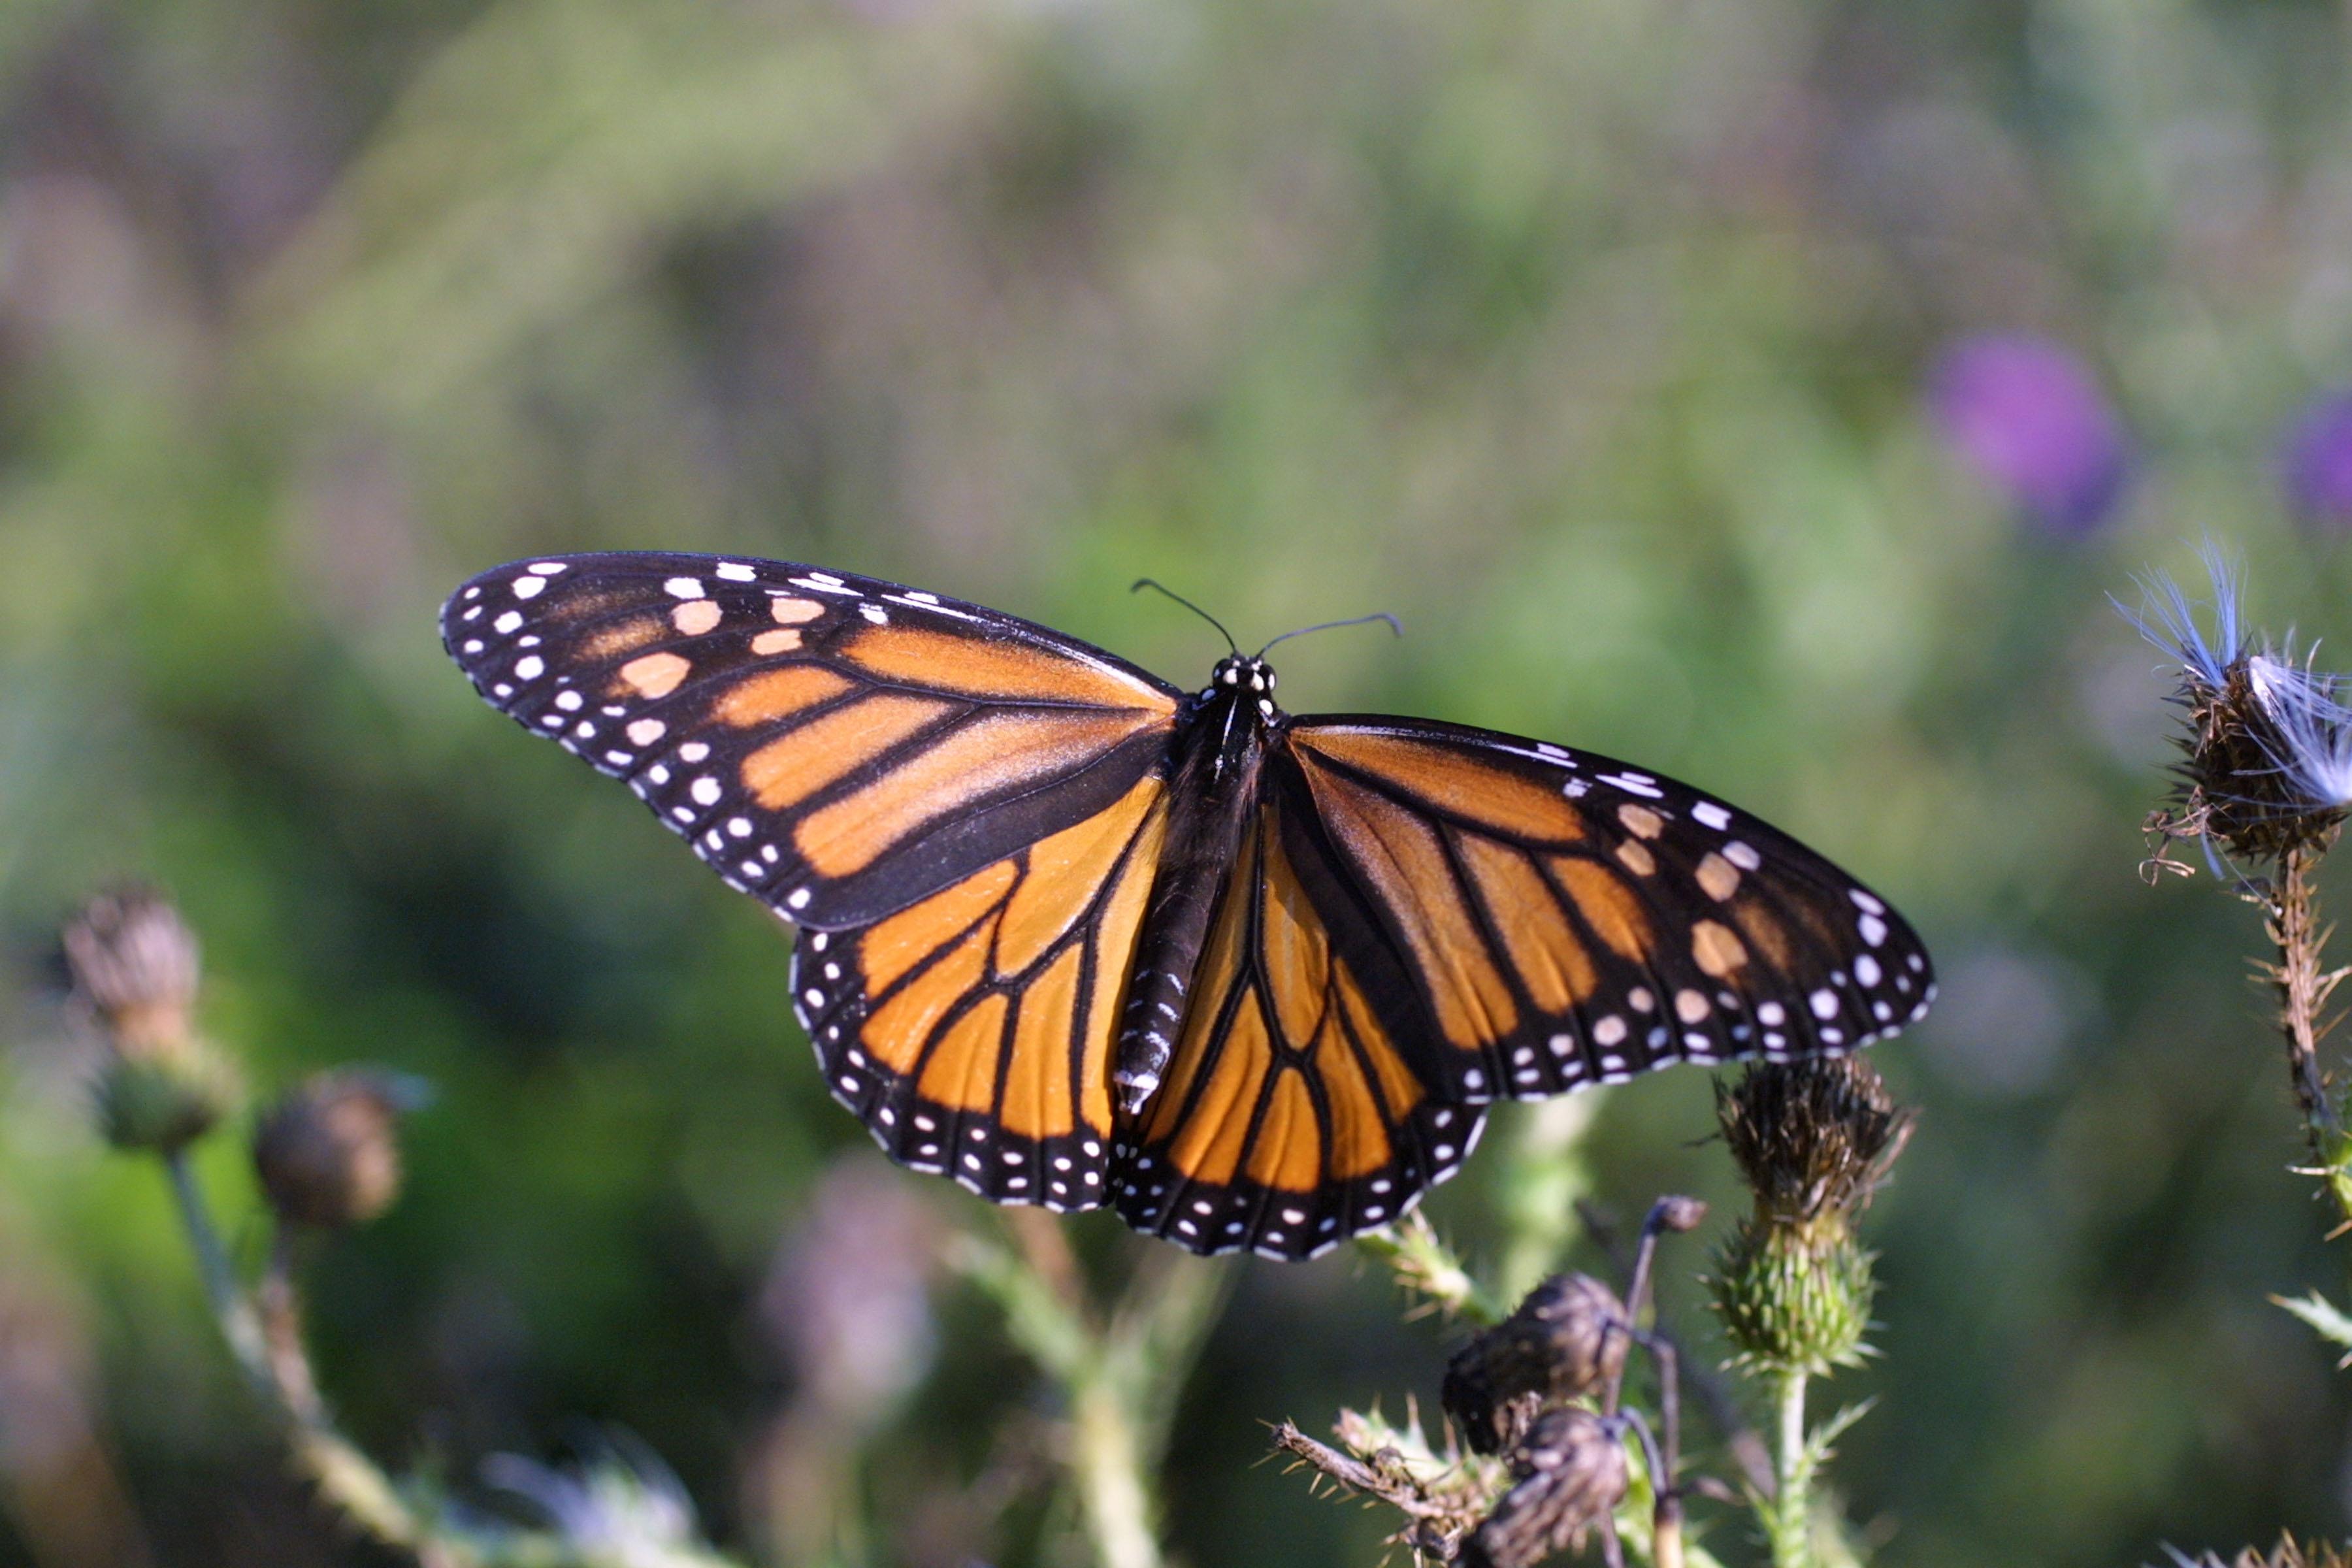 File:National Pollinator Week.jpg - Wikimedia Commons